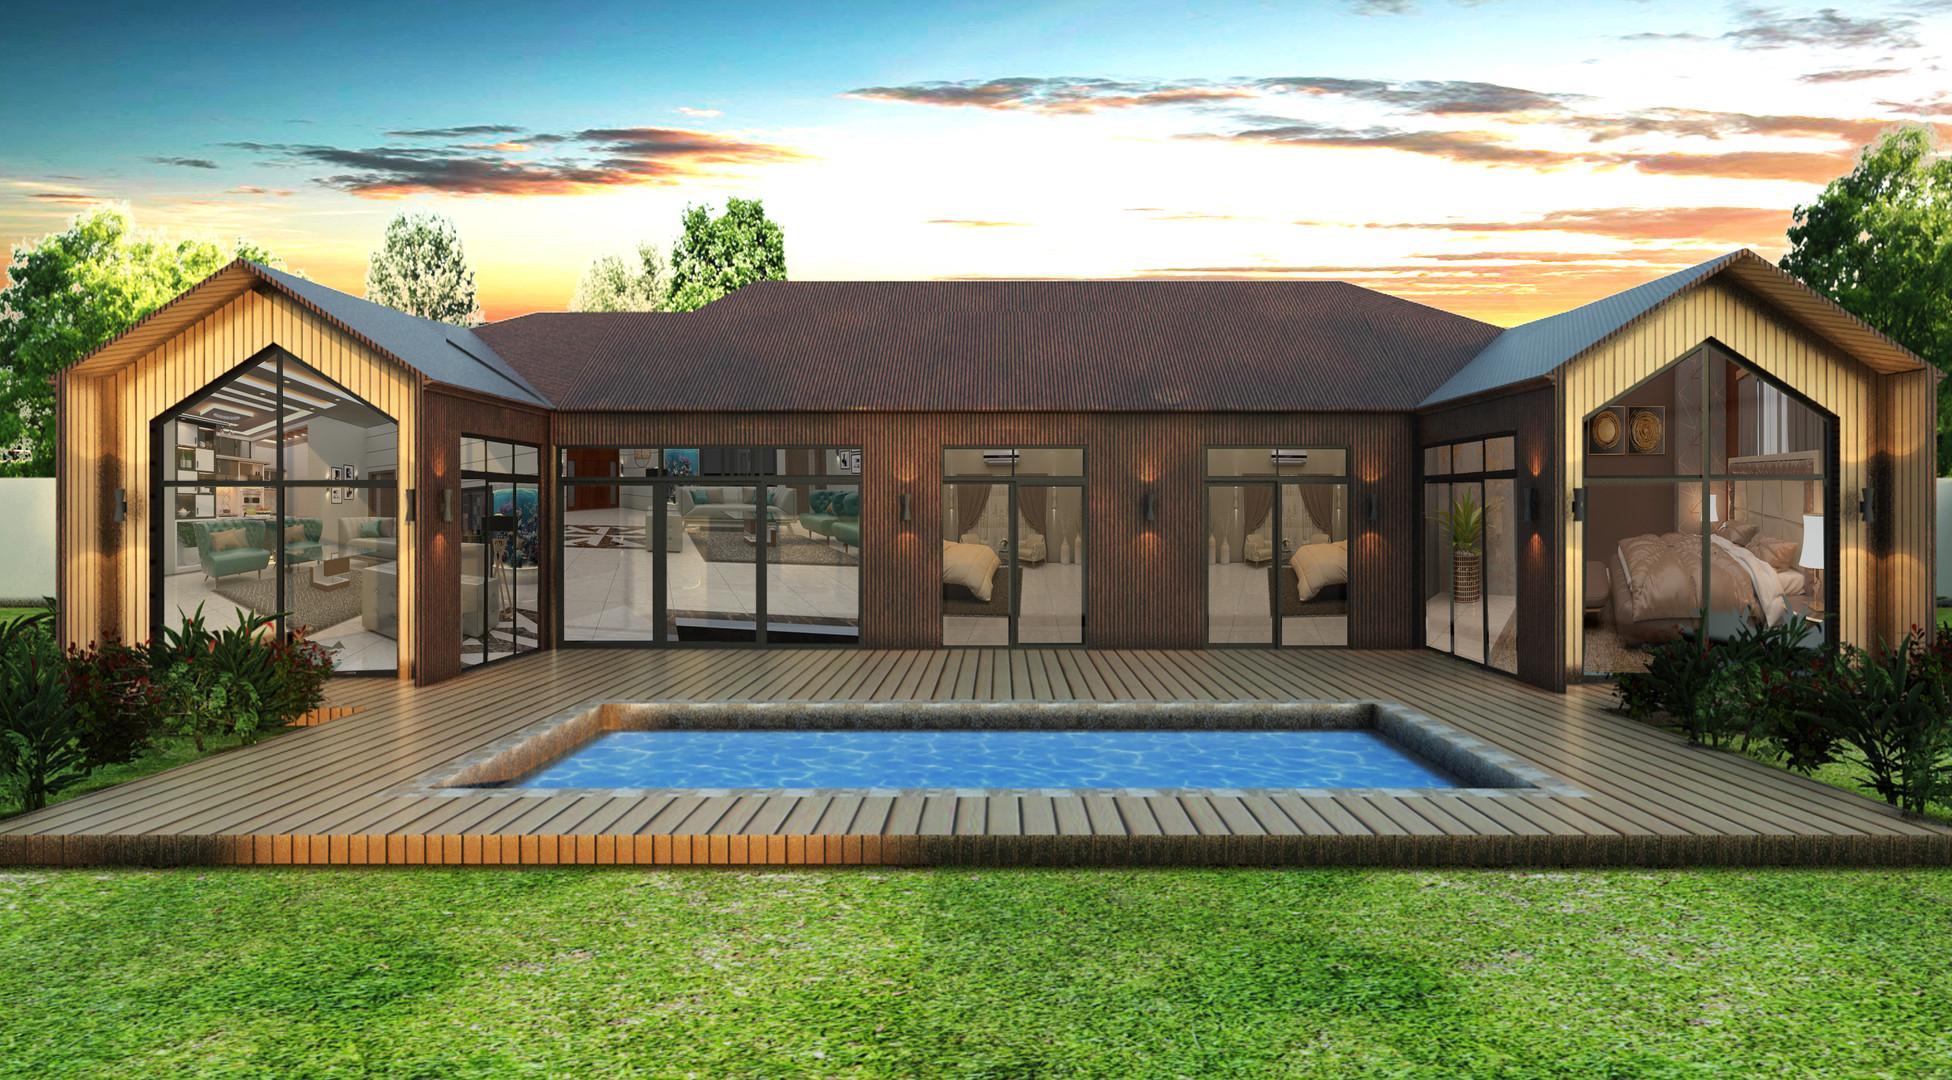 House Exterior Render Design 2